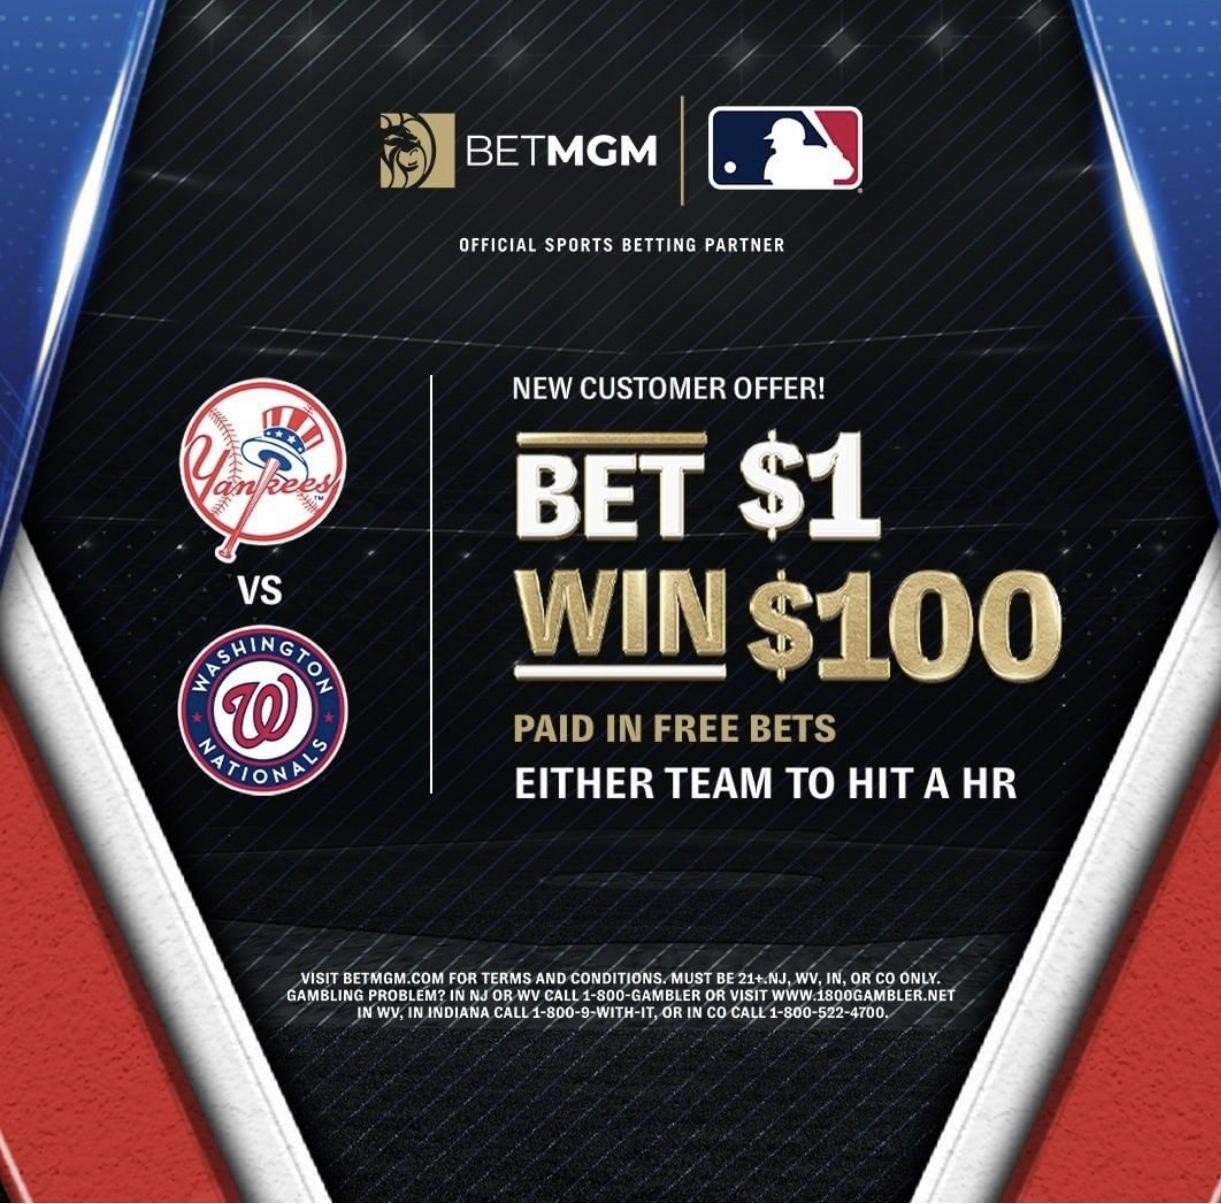 betmgm 100-1 odds opening day